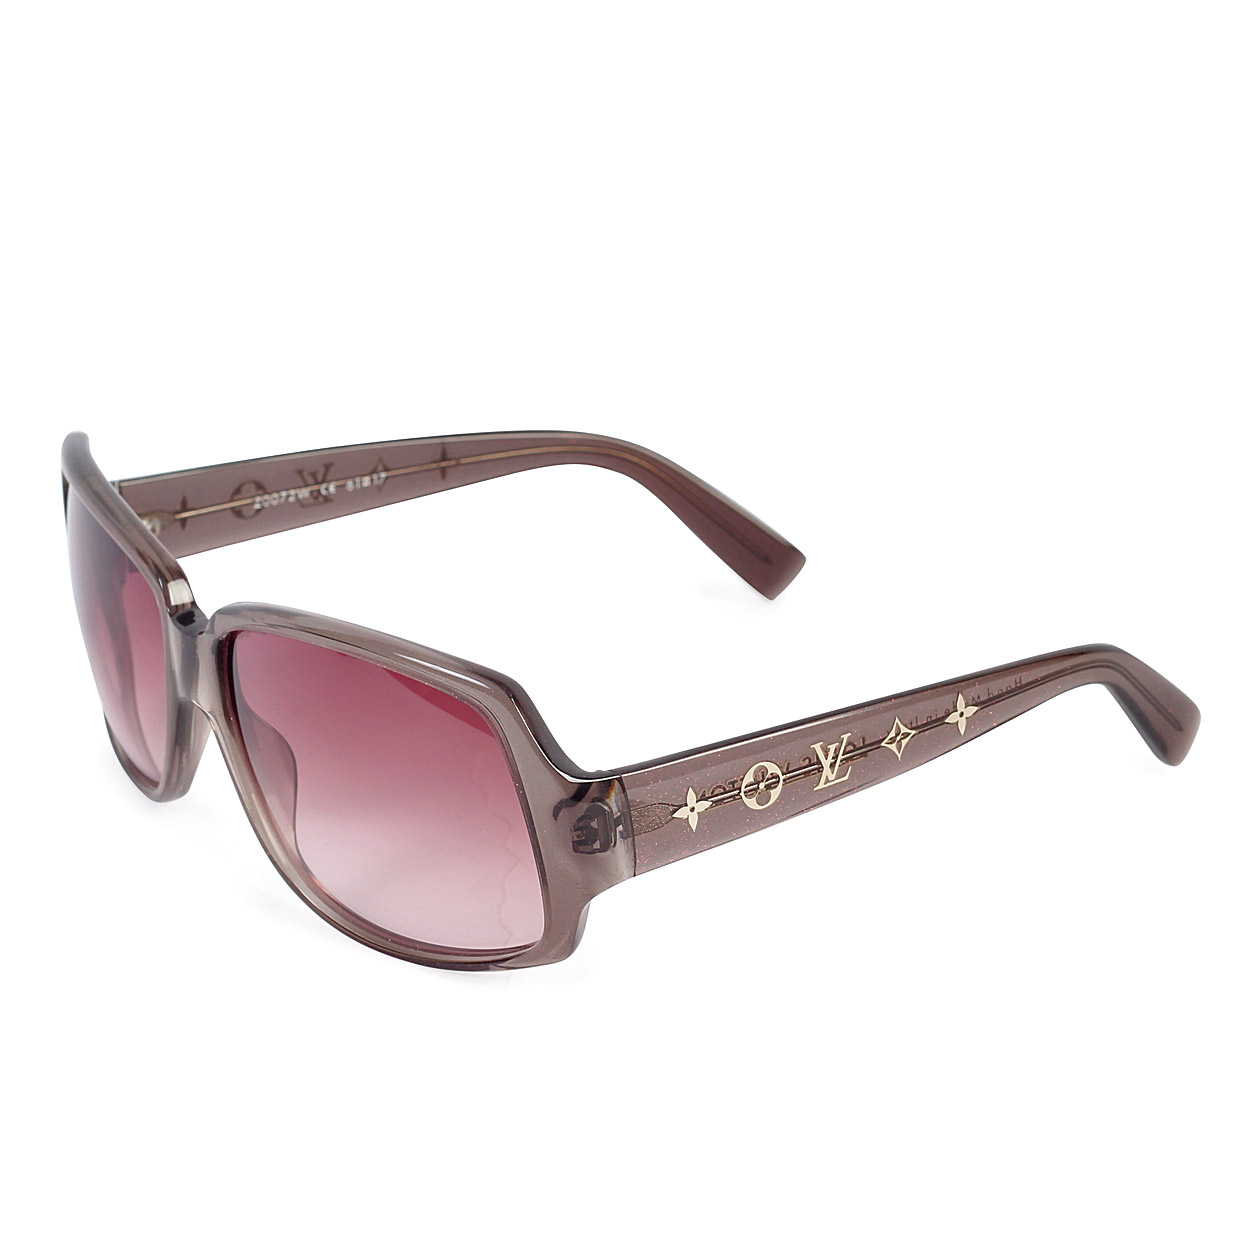 8d7e30d466 Louis Vuitton Frames